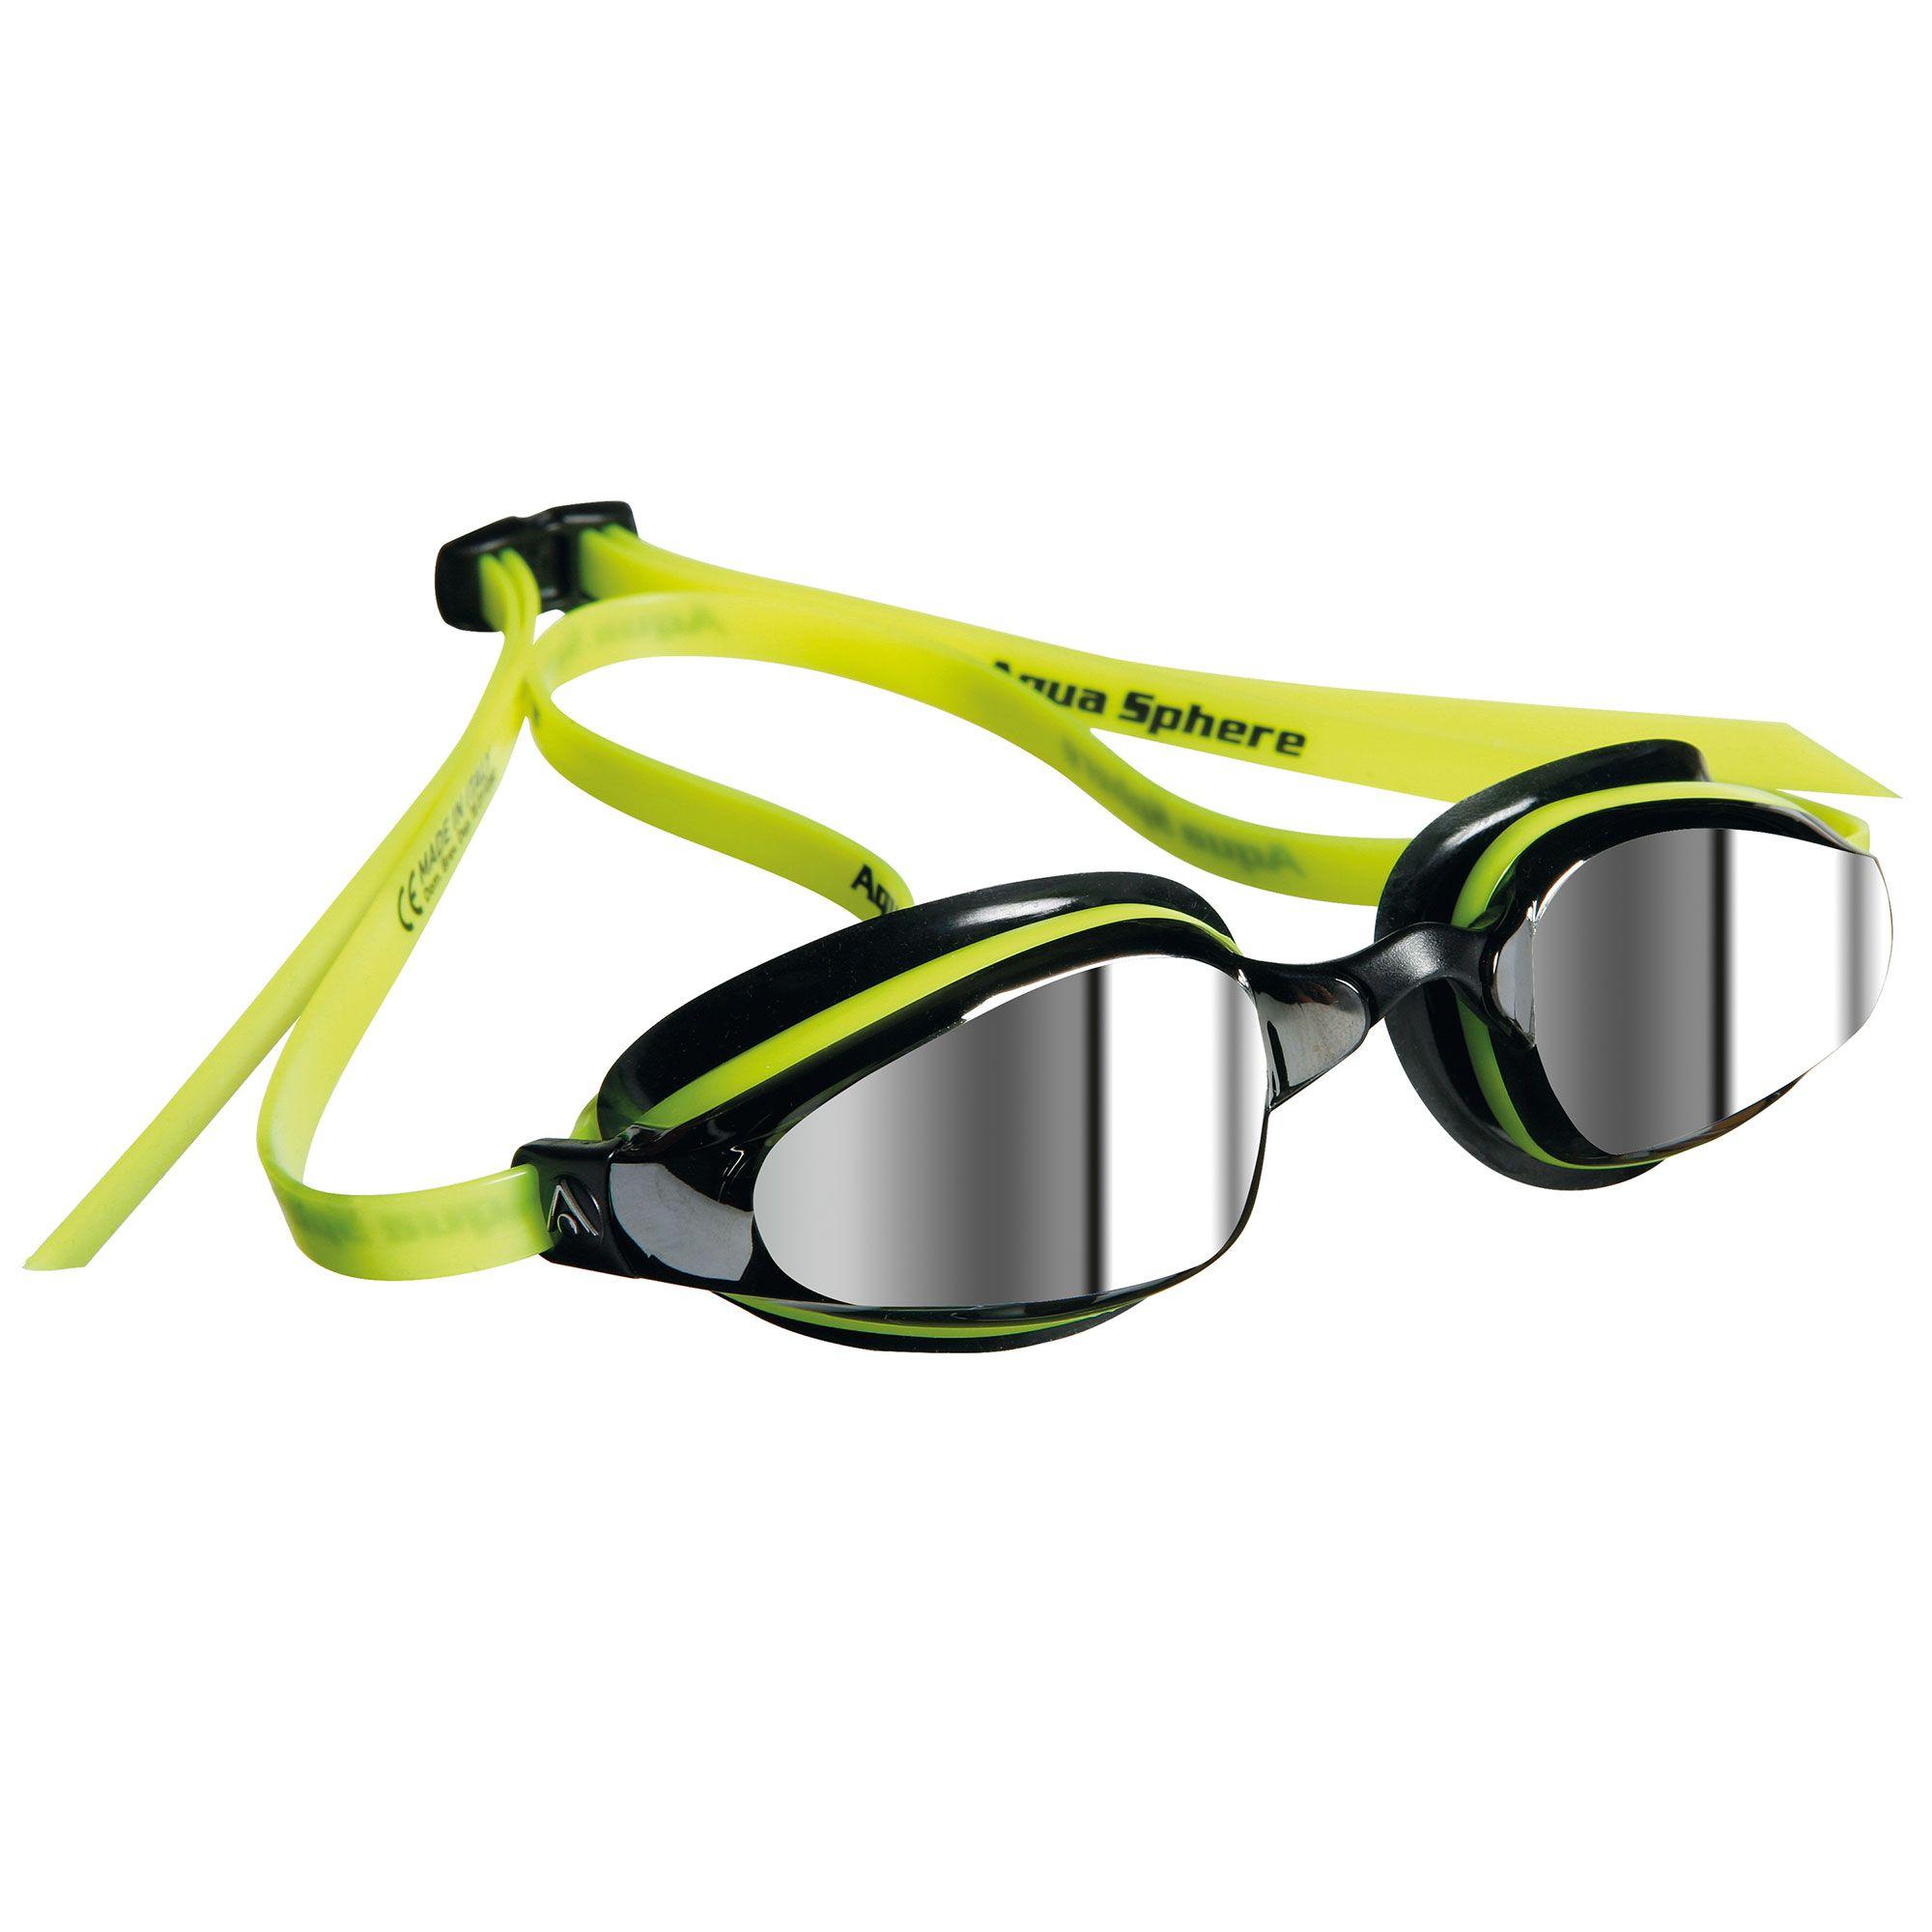 Aqua Sphere K180 Swimming Goggles Mirrored Lens